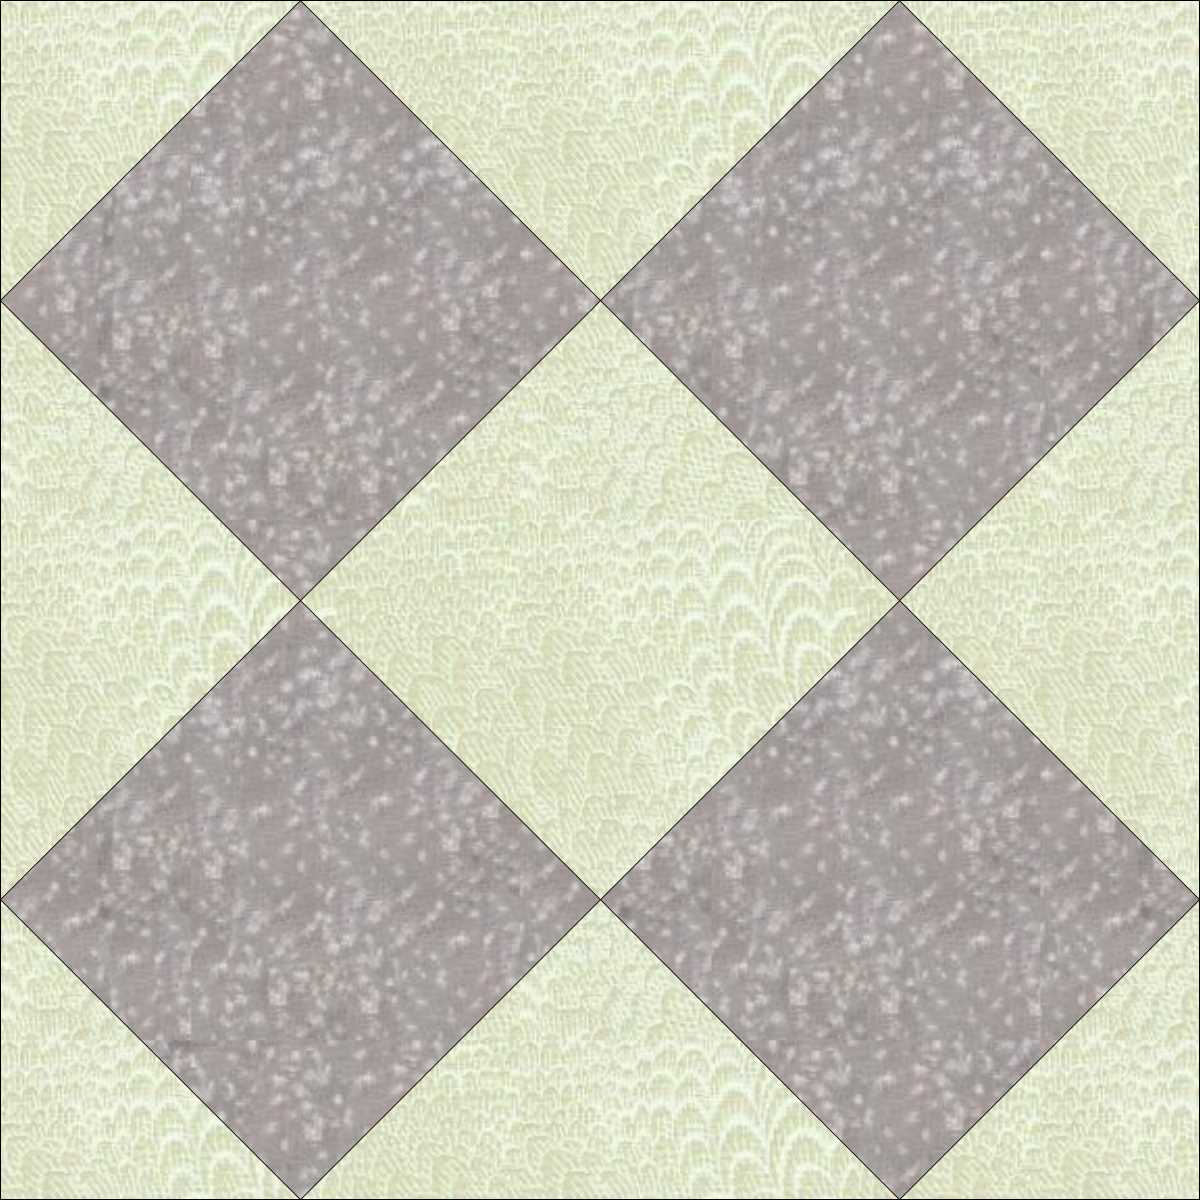 crossroads-quilt block